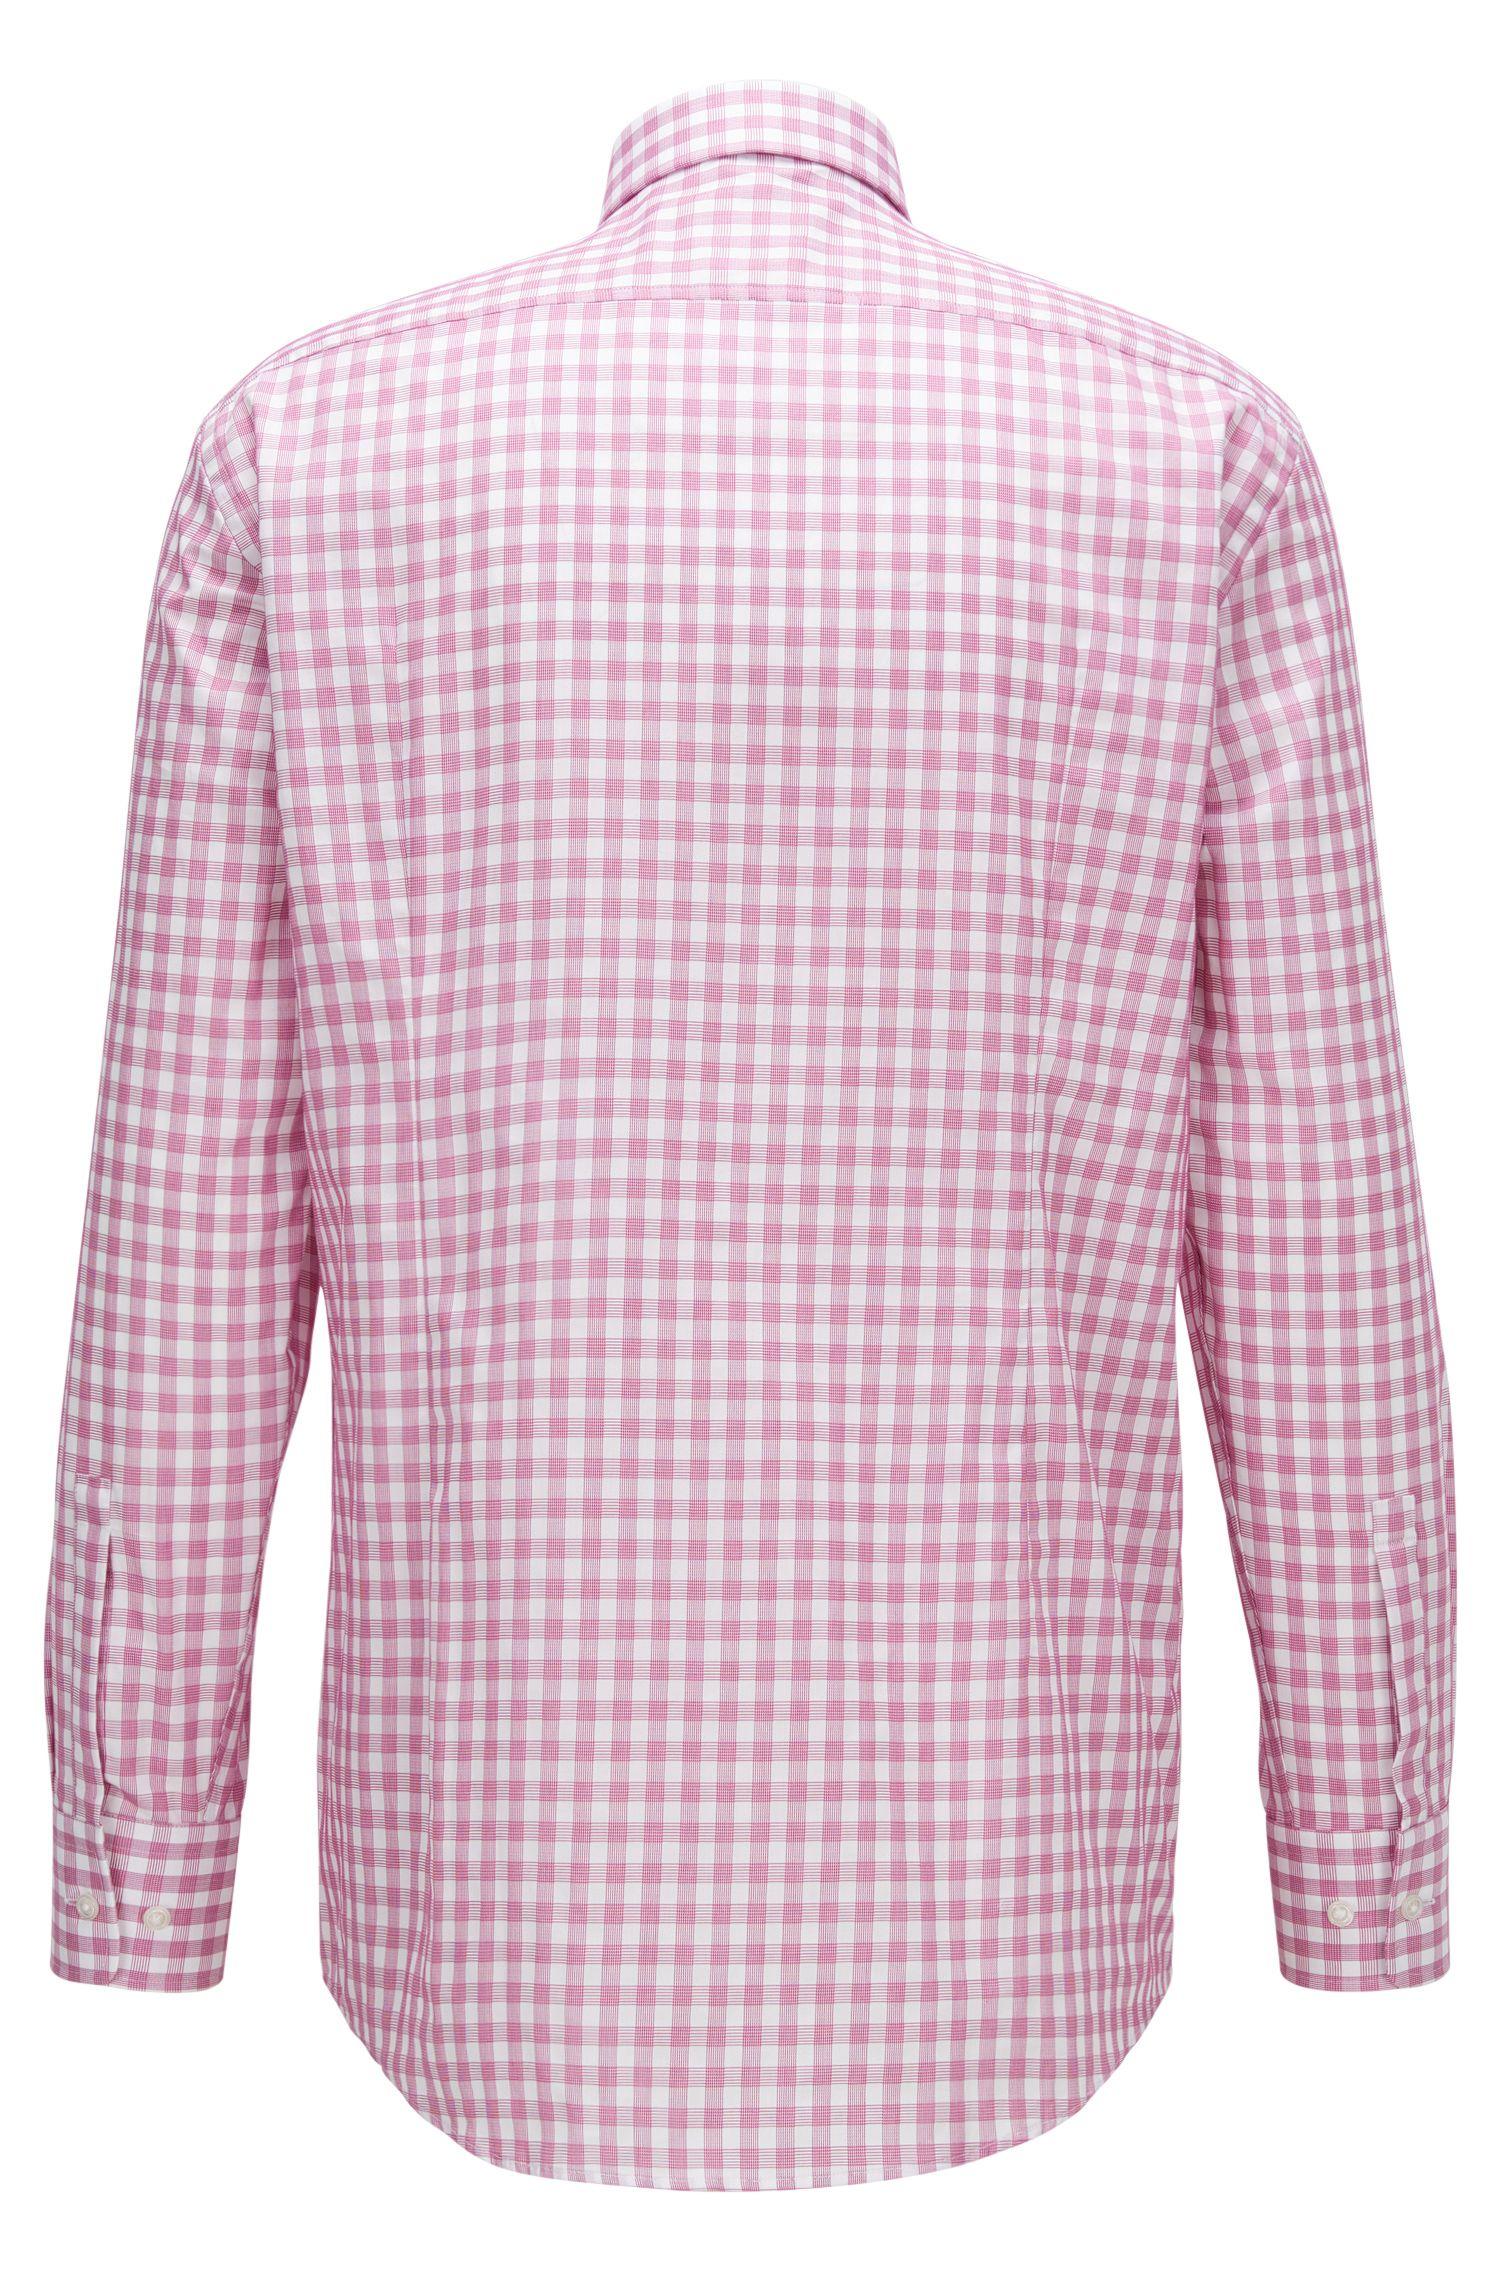 Checked Cotton Dress Shirt, Sharp Fit | Marley US, Dark pink